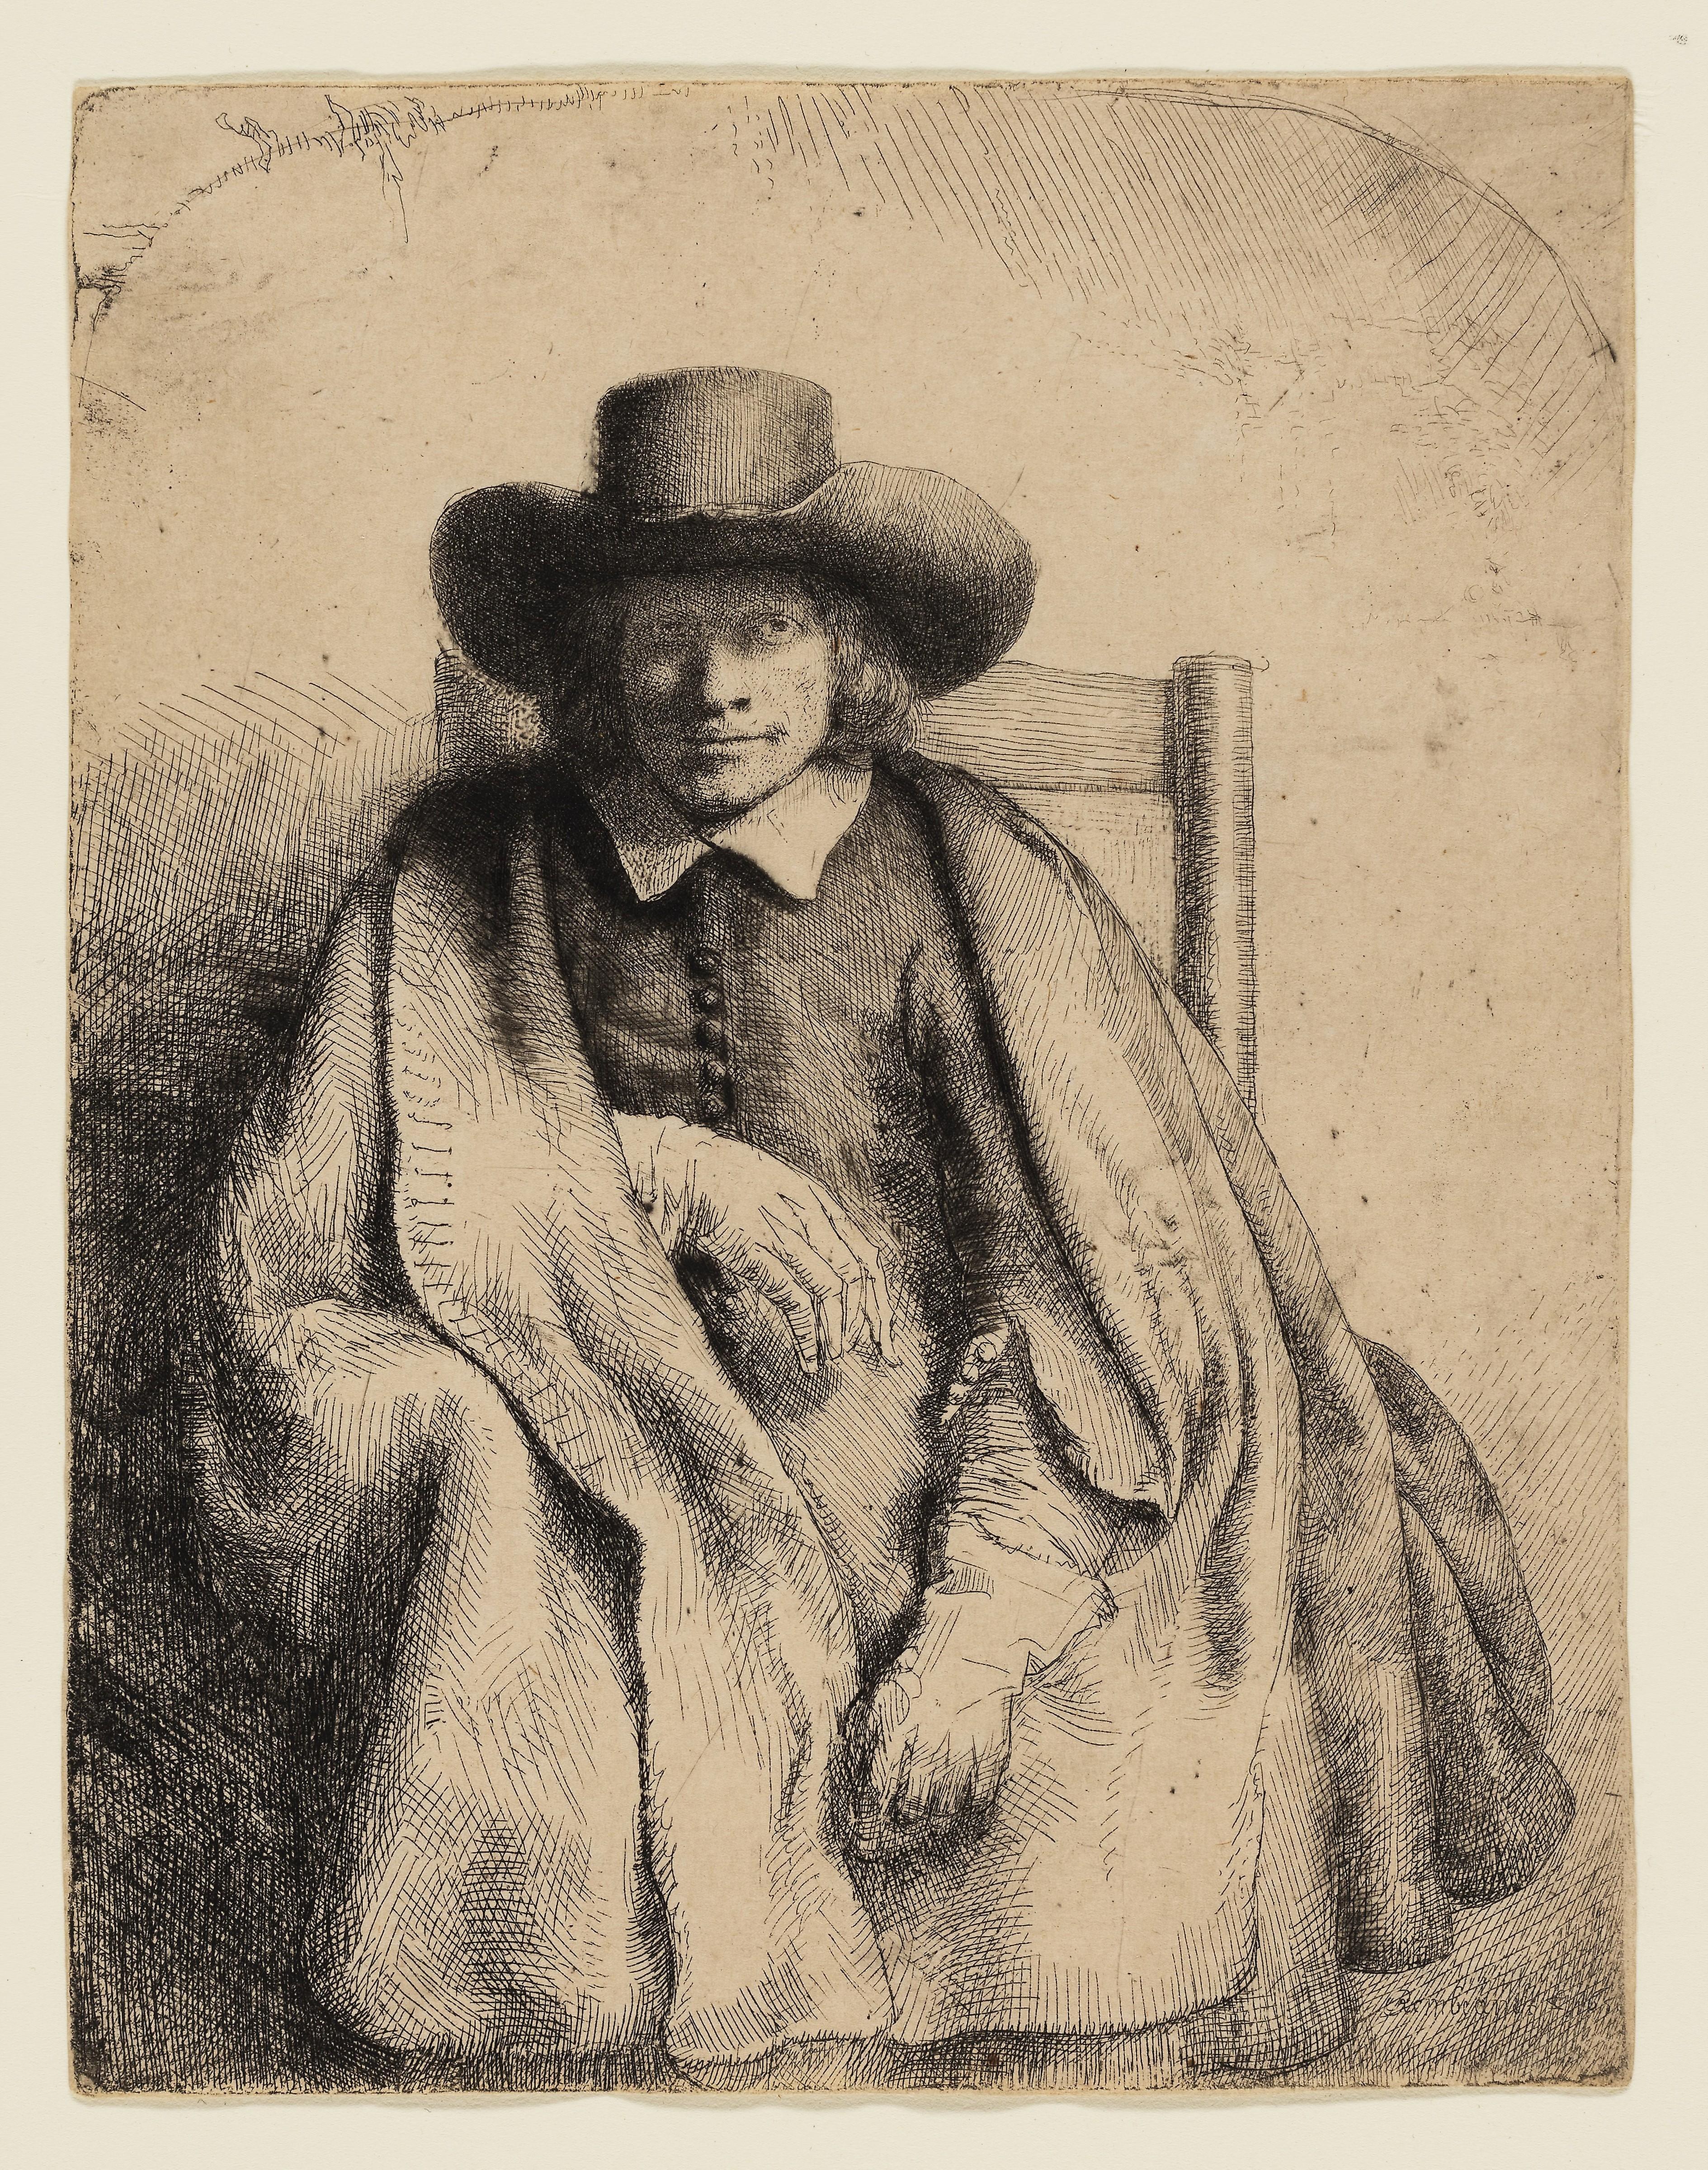 Clement de Jonghe. Printseller. 1651. Rembrandt van Rijn. Dutch. 1606-1669. Holland. Etching on buff laid paper. 208 x 162 mm (image. sheet trimmed within plate)